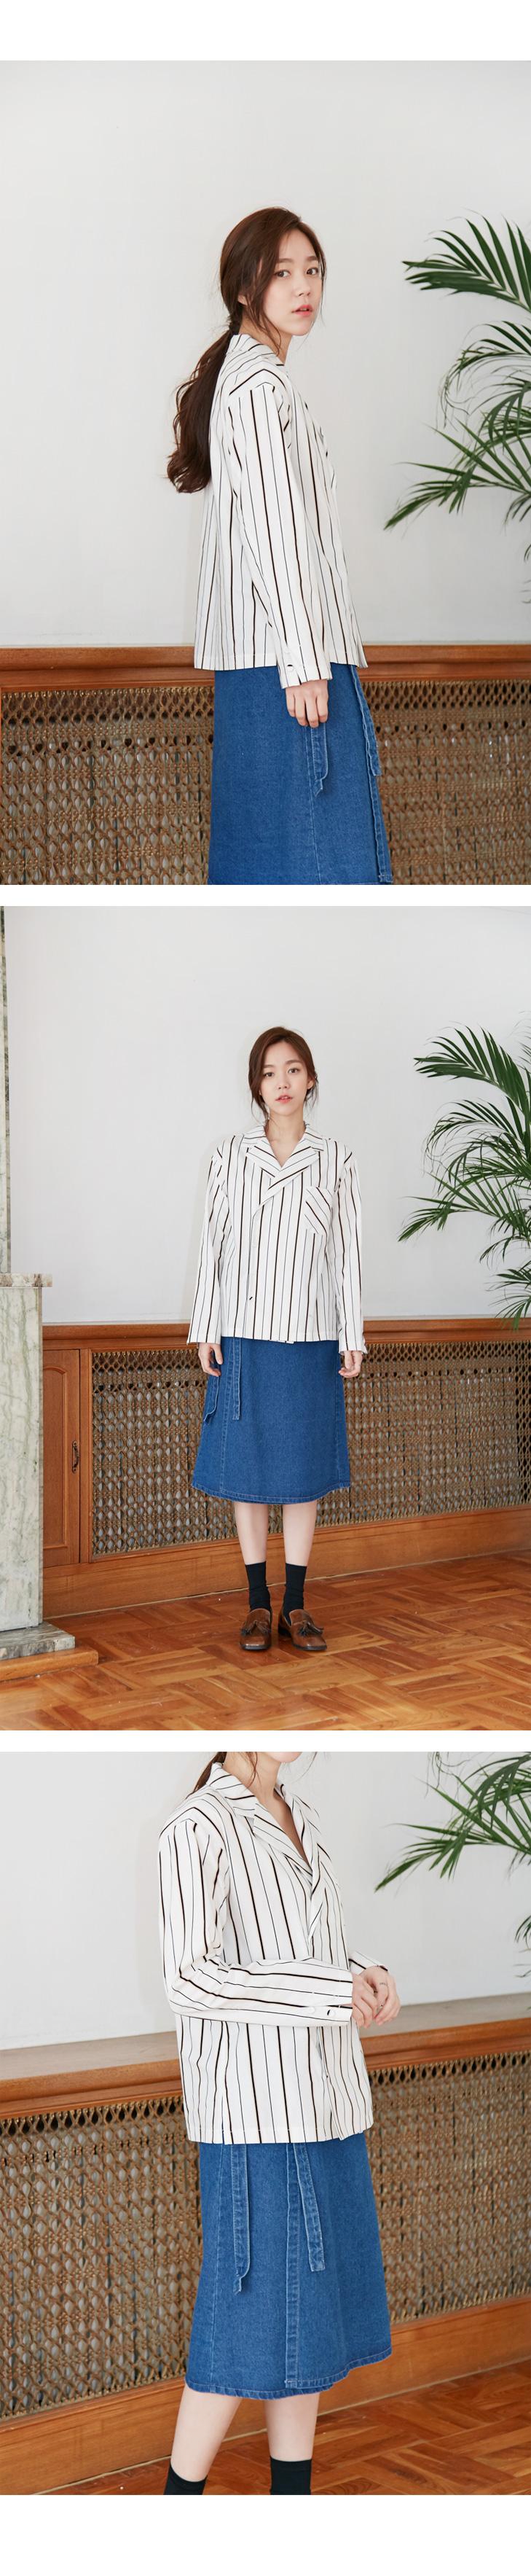 Made_top-147_wear stripe cotton shirts (size : free)